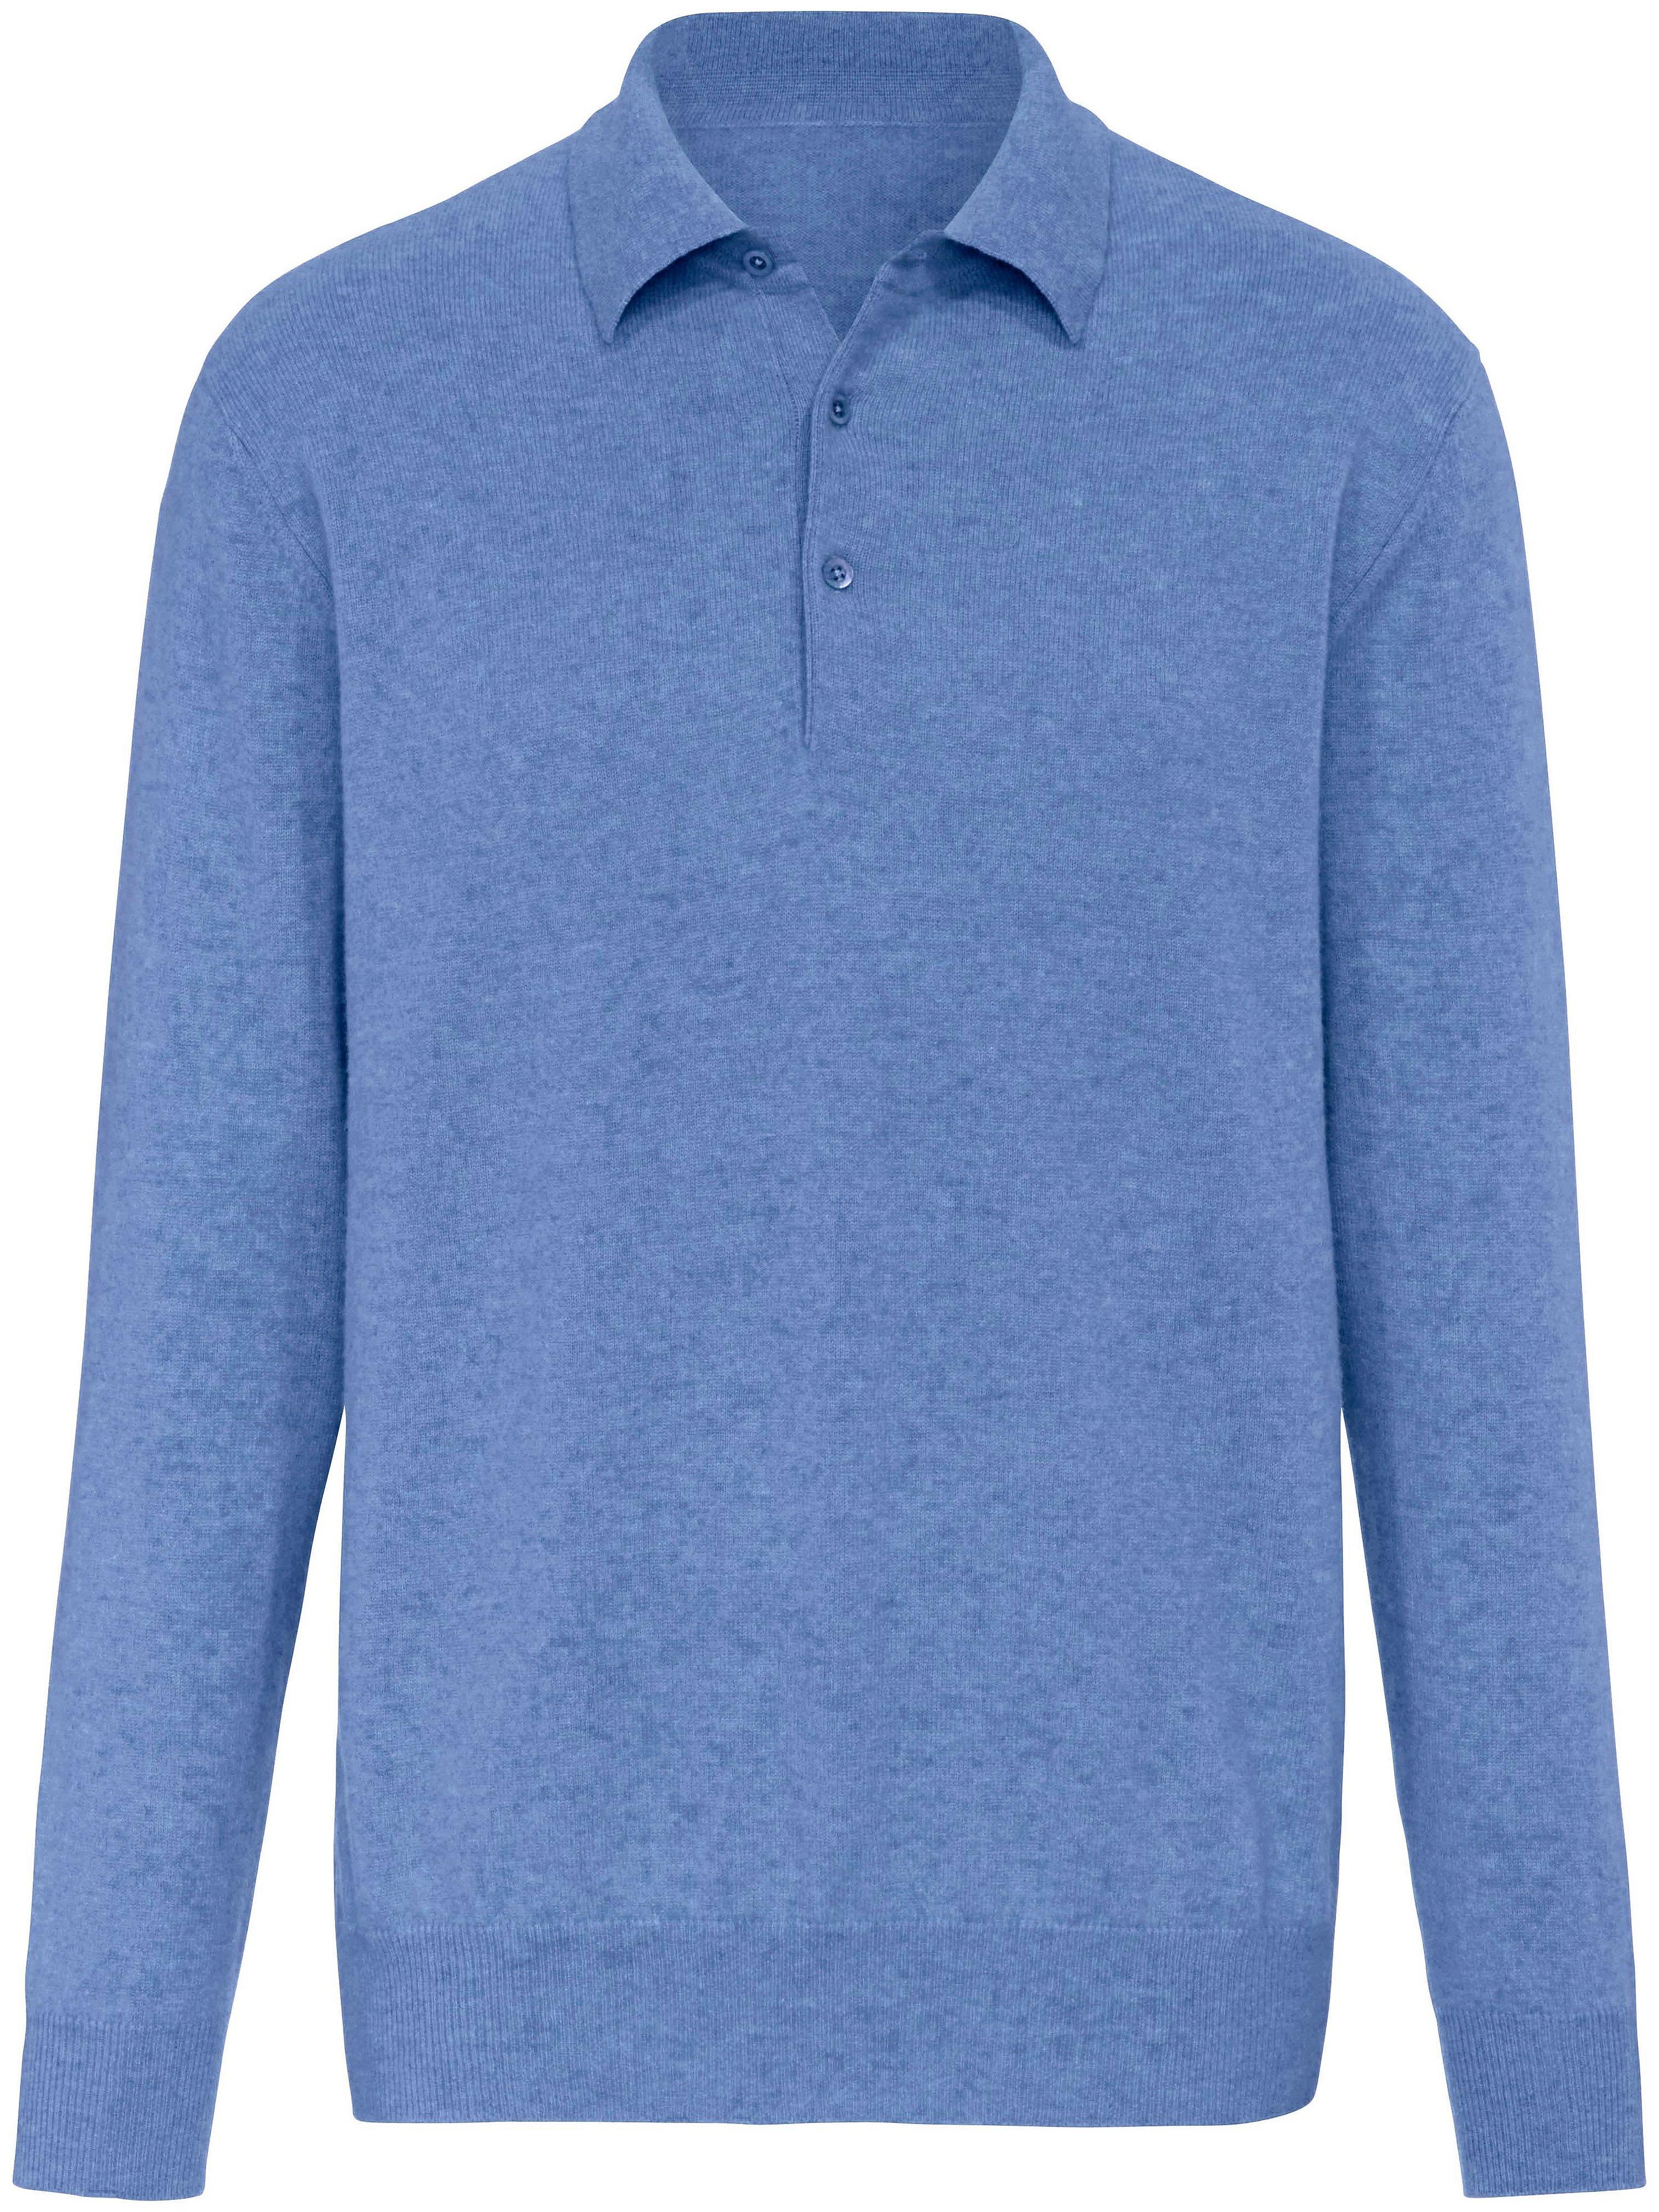 Polotrui 100% kasjmier kleine knopenlijst Van Peter Hahn Cashmere blauw